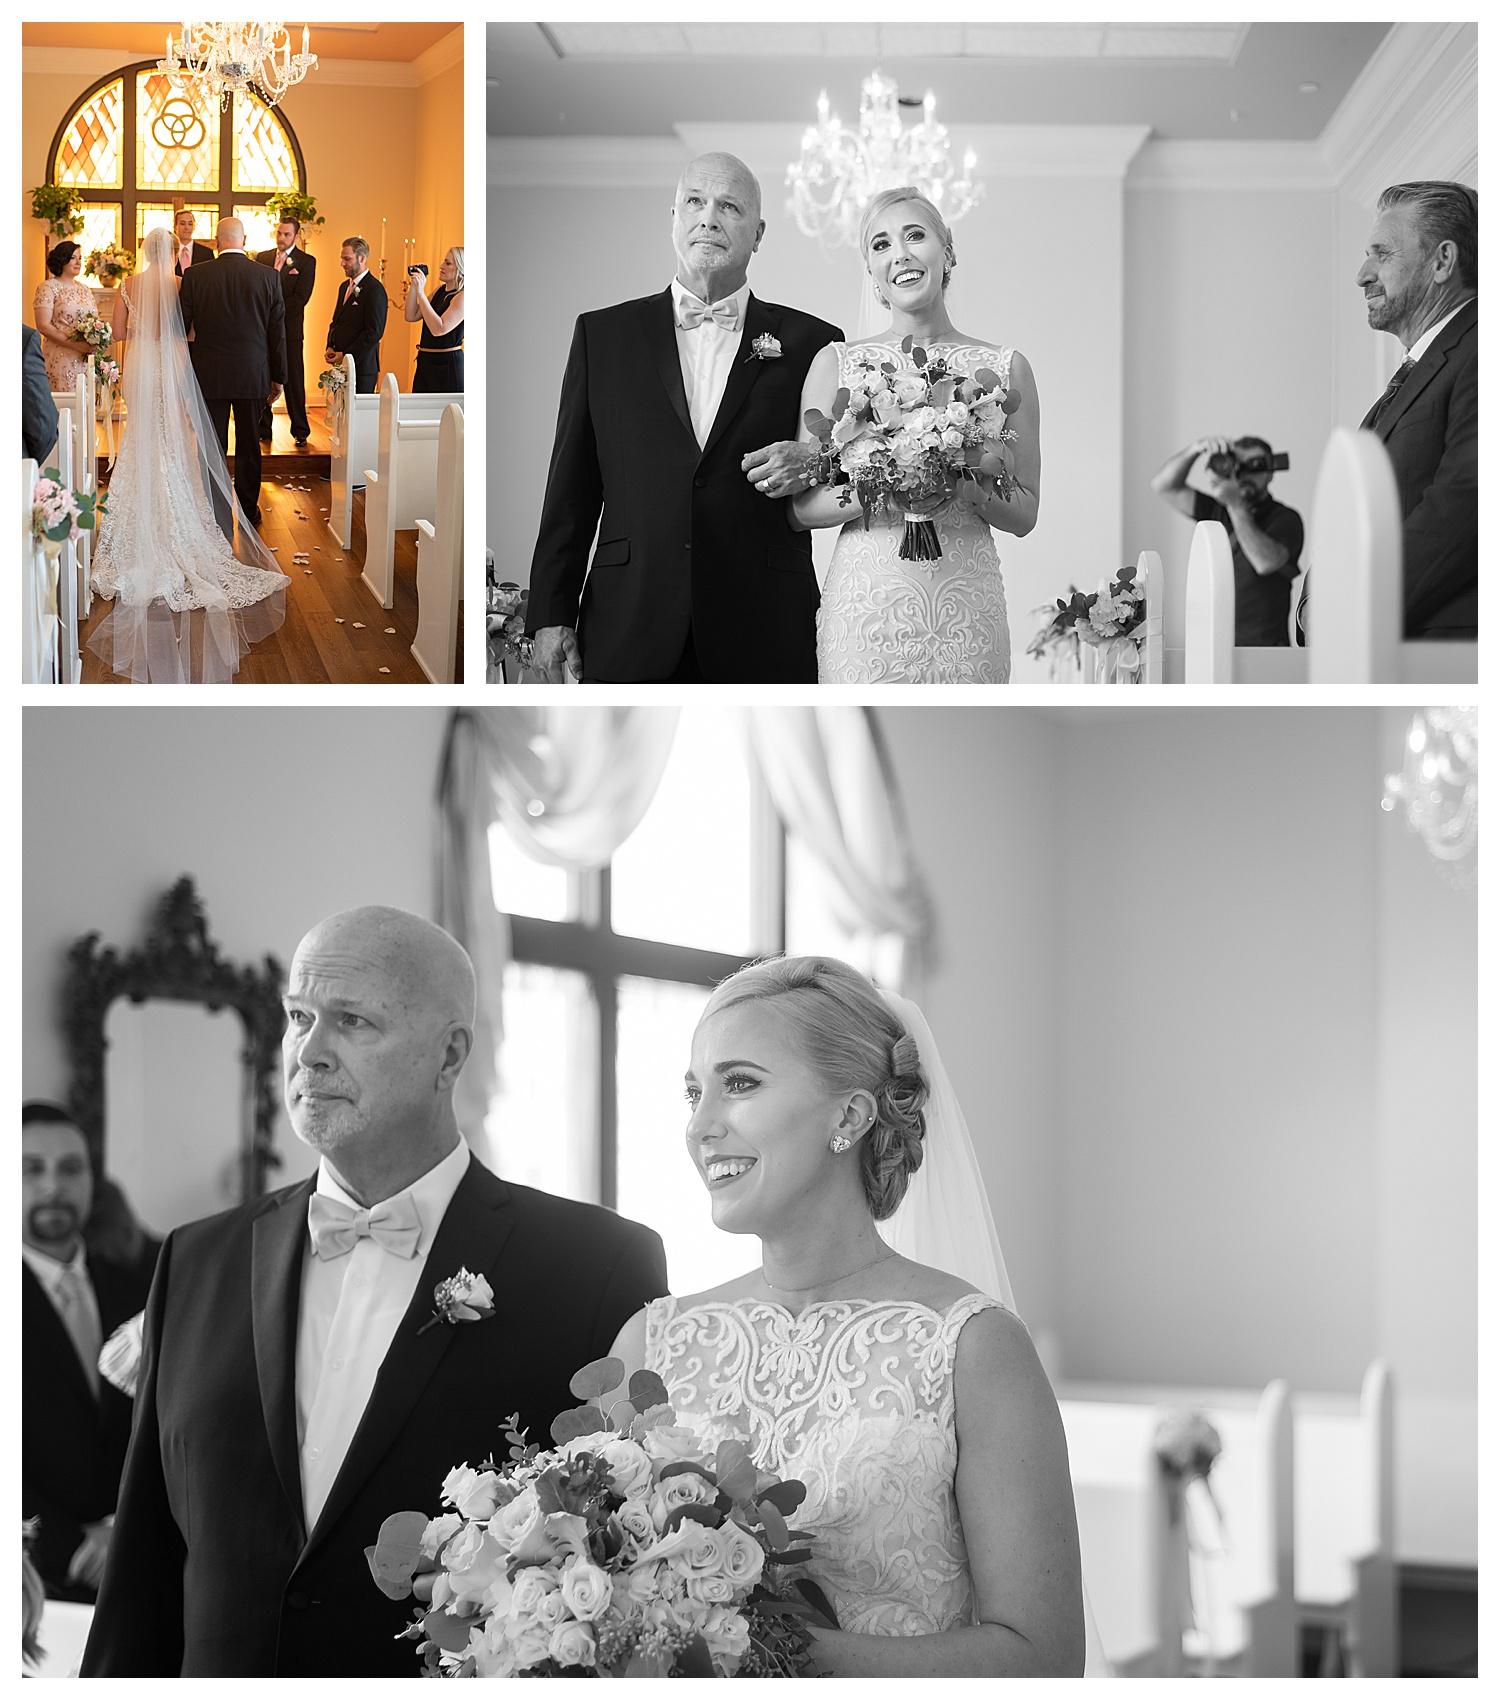 St. Augustine Wedding - Amore Wedding Chapel - 029.JPG